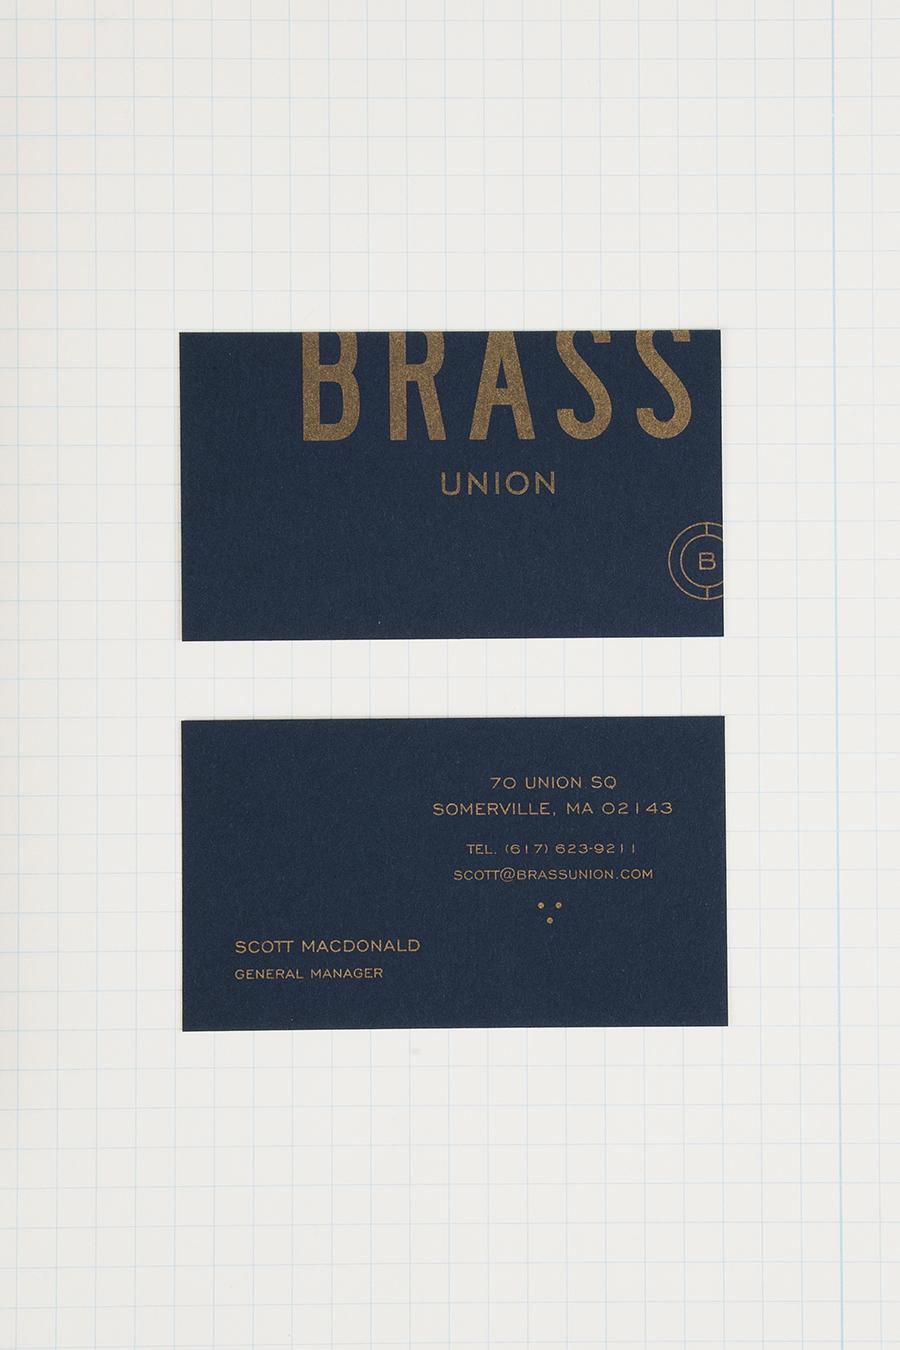 Brass Union餐厅vi设计,品牌设计,名片设计